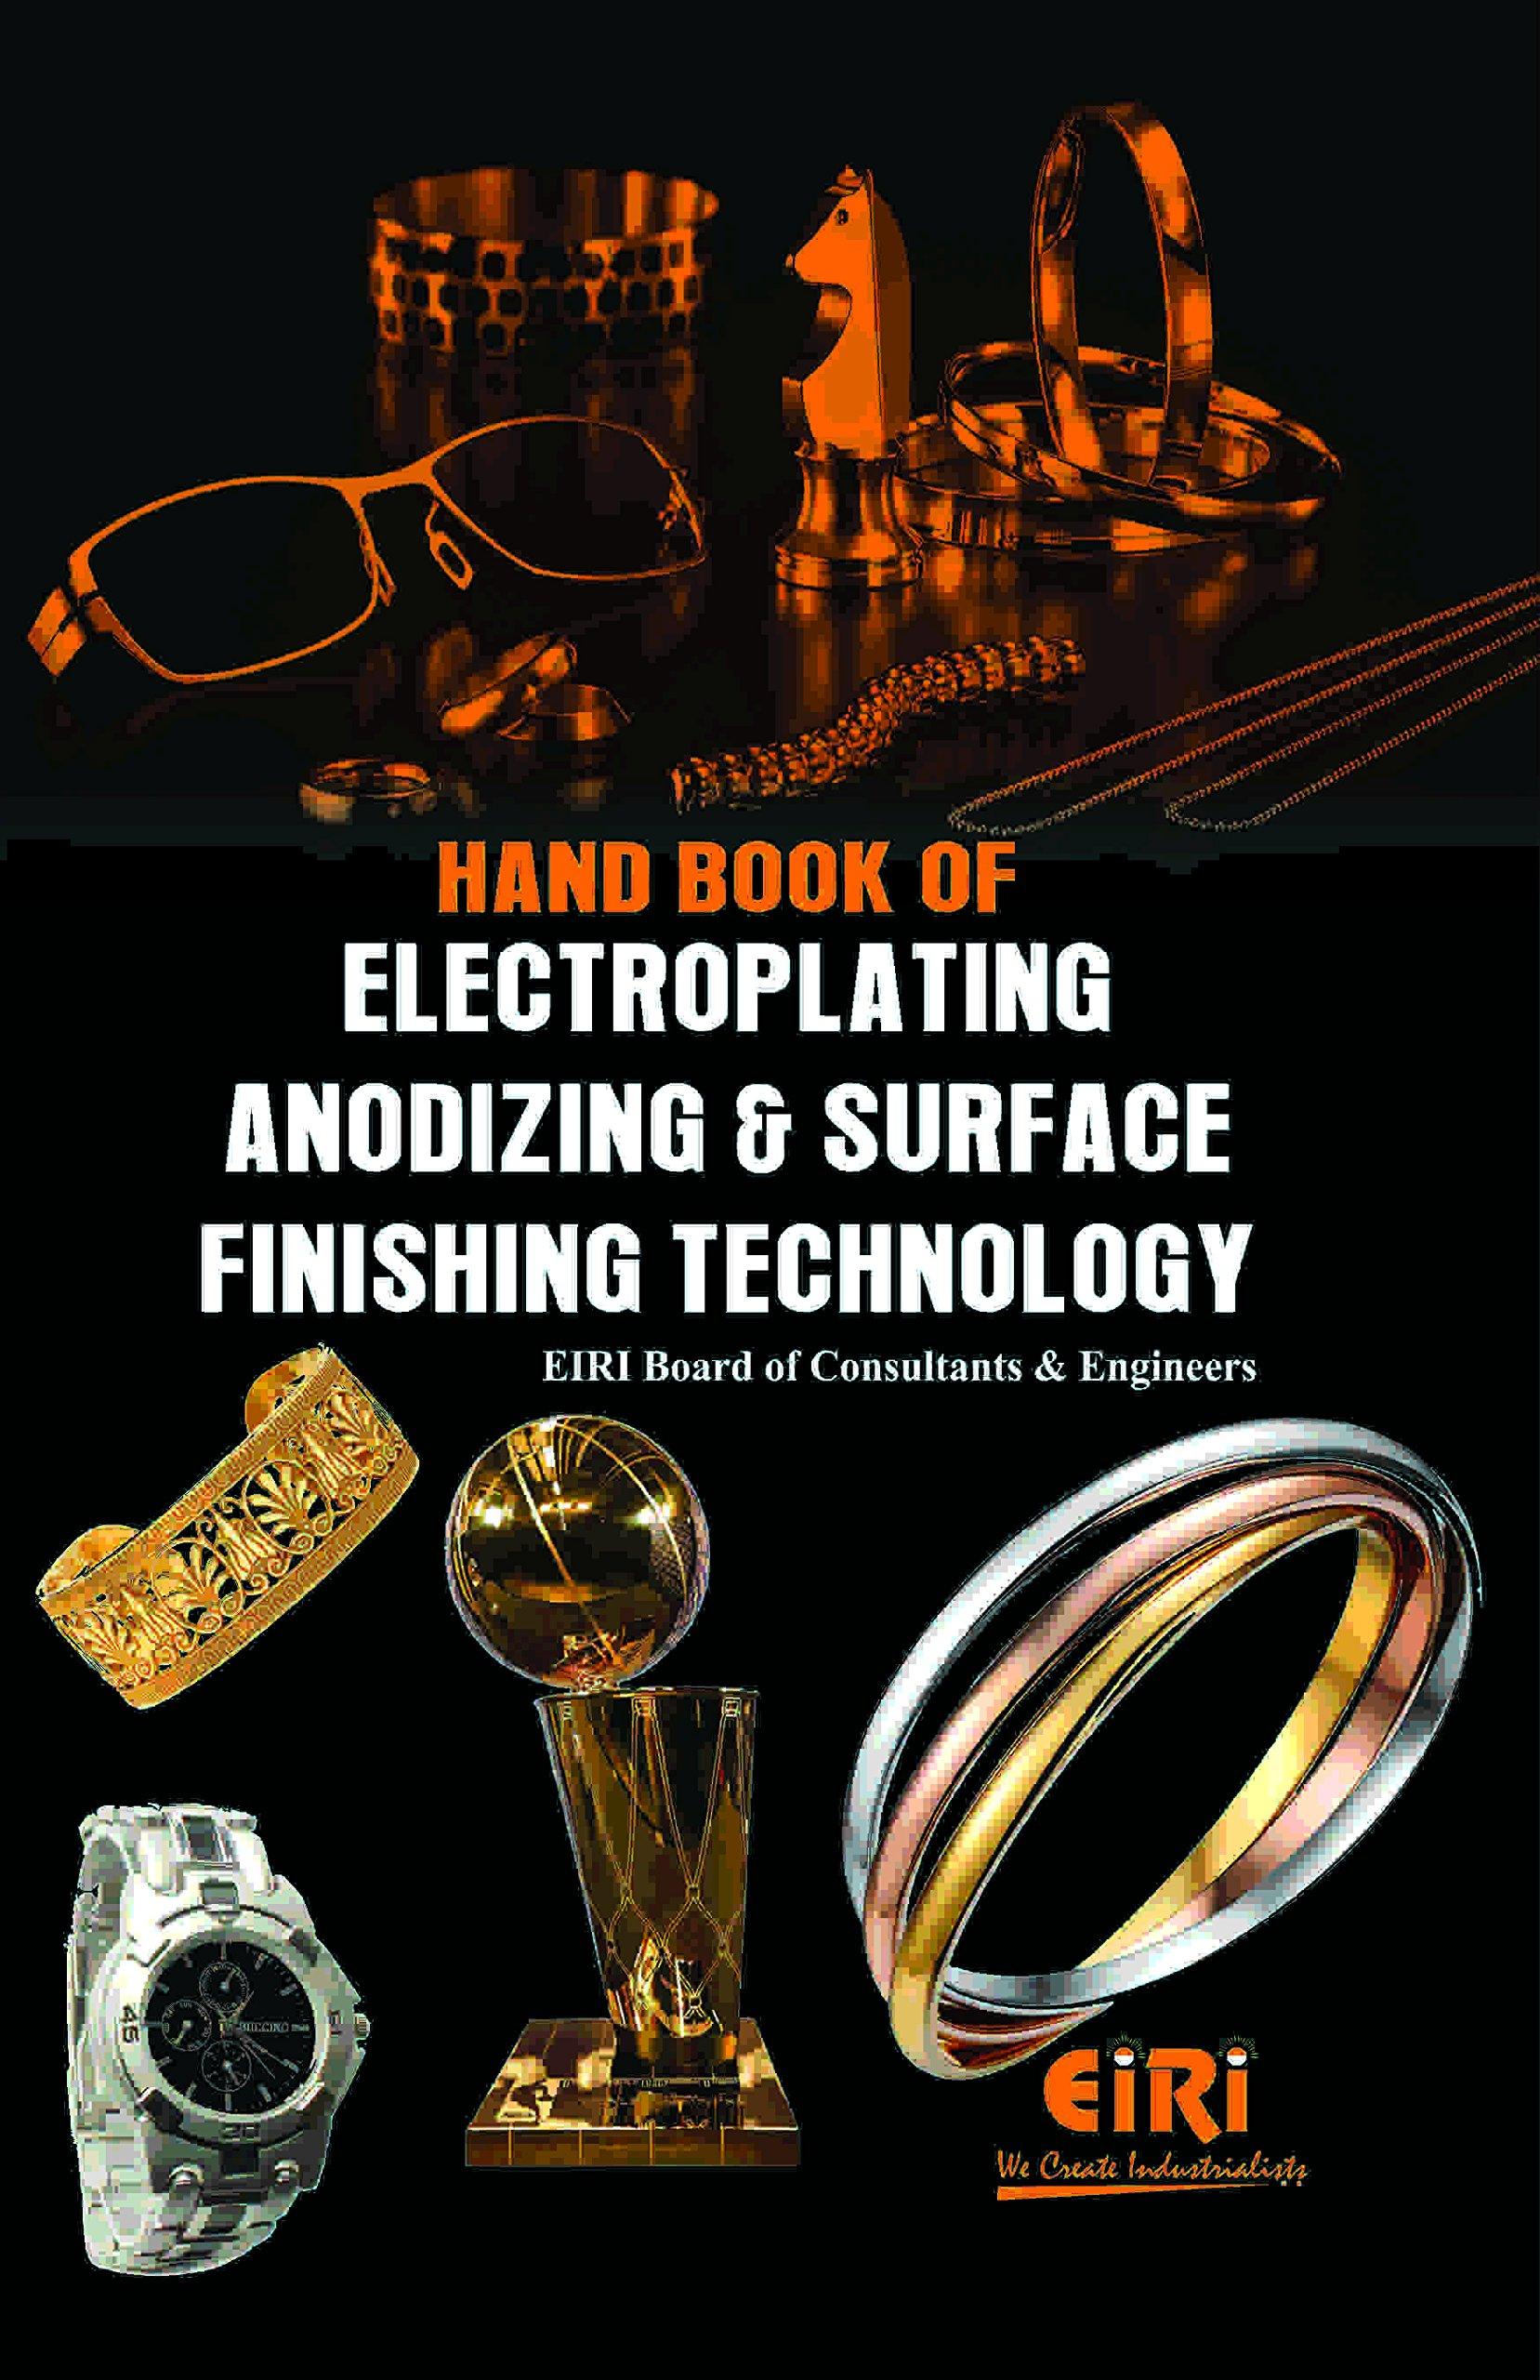 Hand Book Of Electroplating Anodizing & Surface Finishing Technology